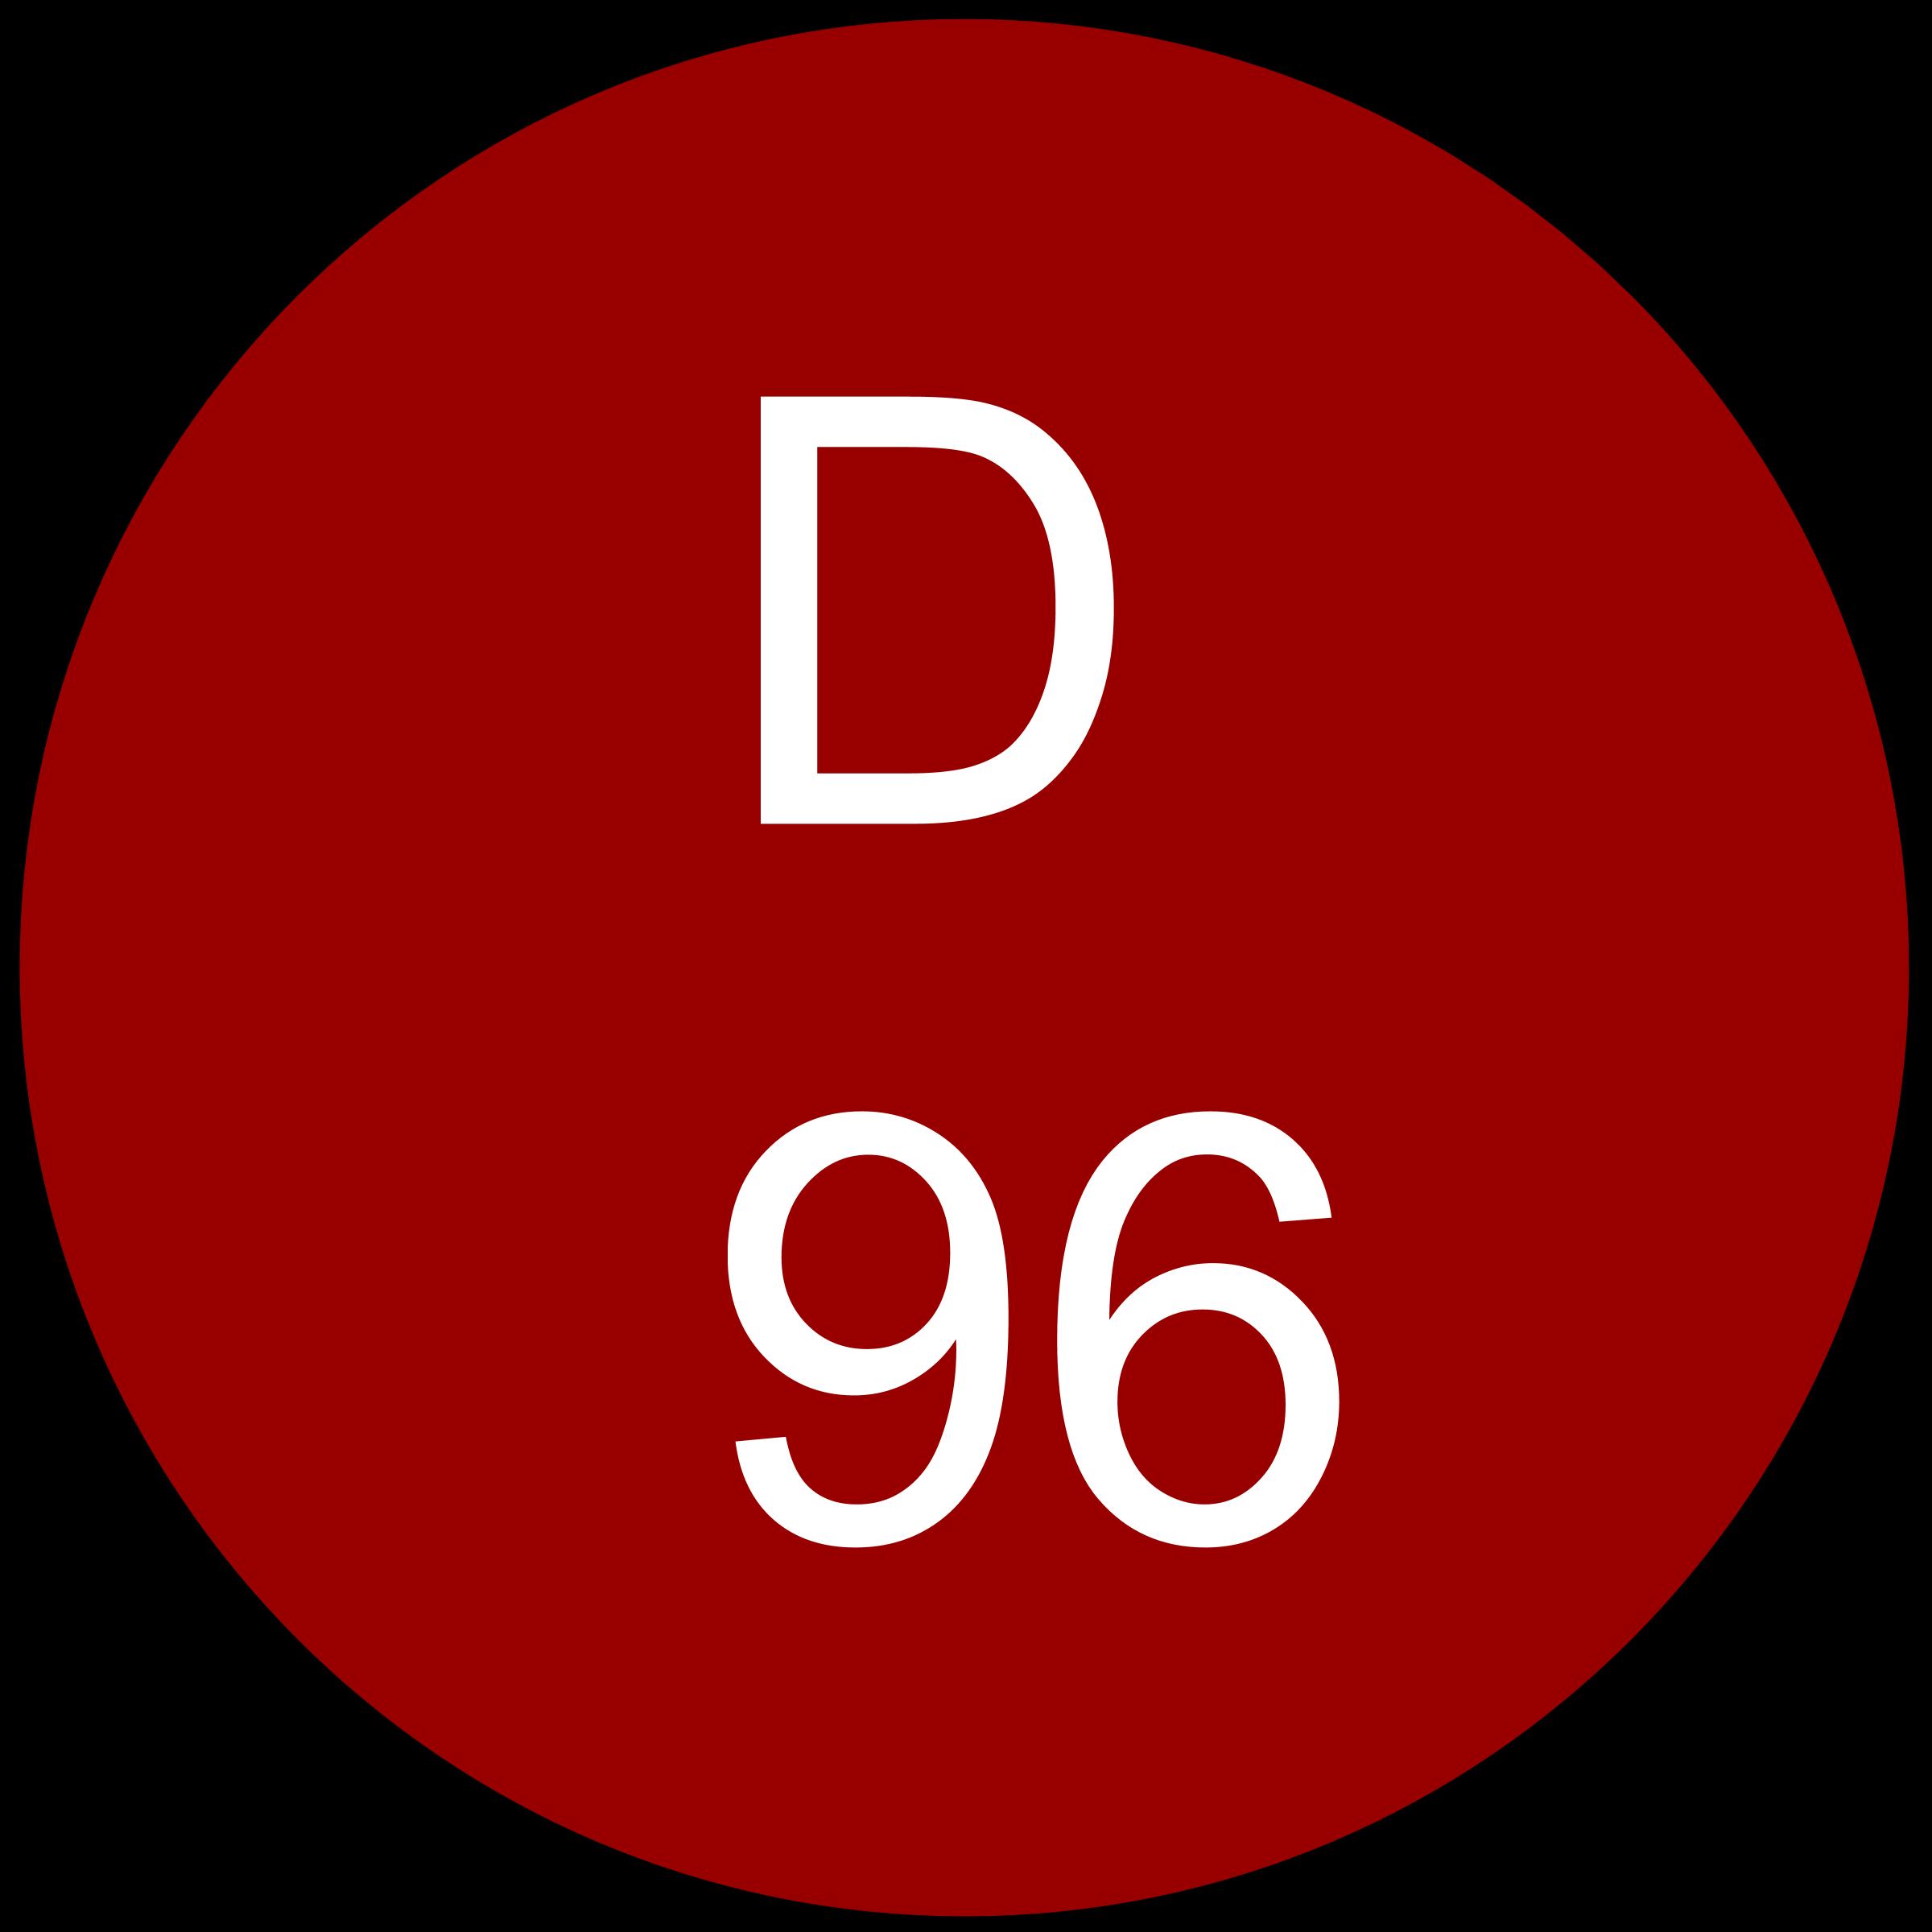 decanter-96